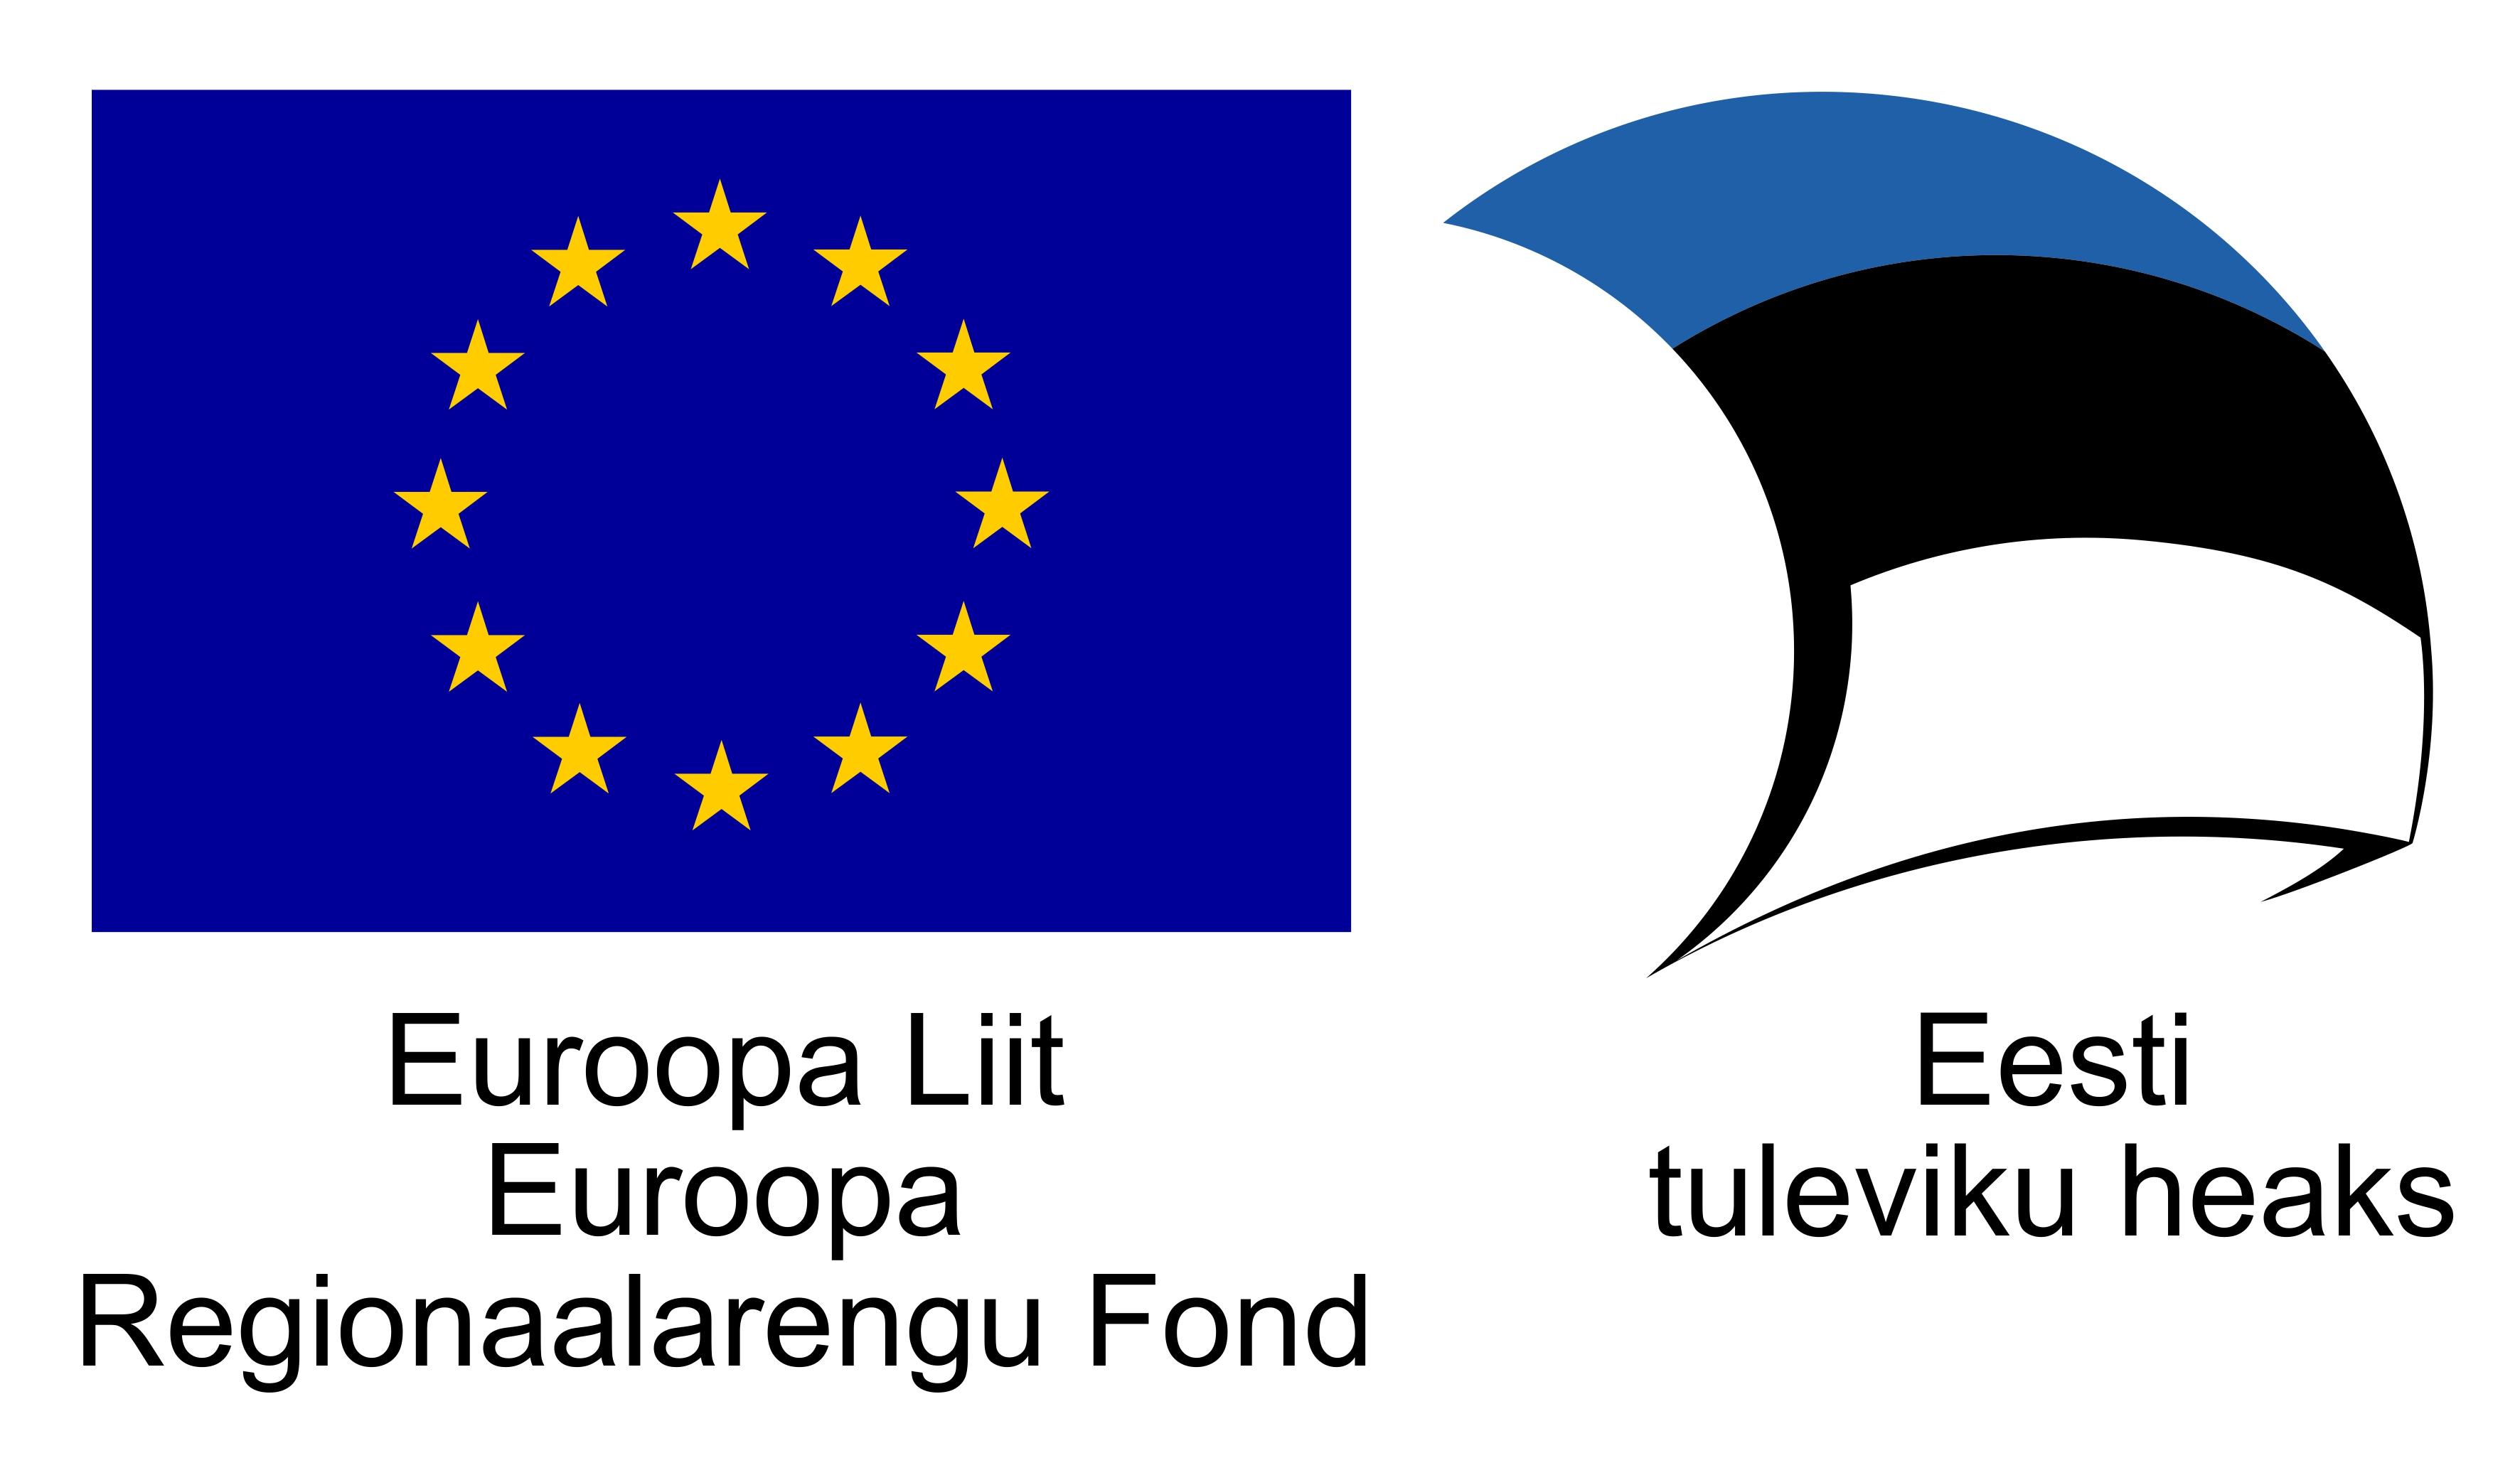 Euroopa Liit logo